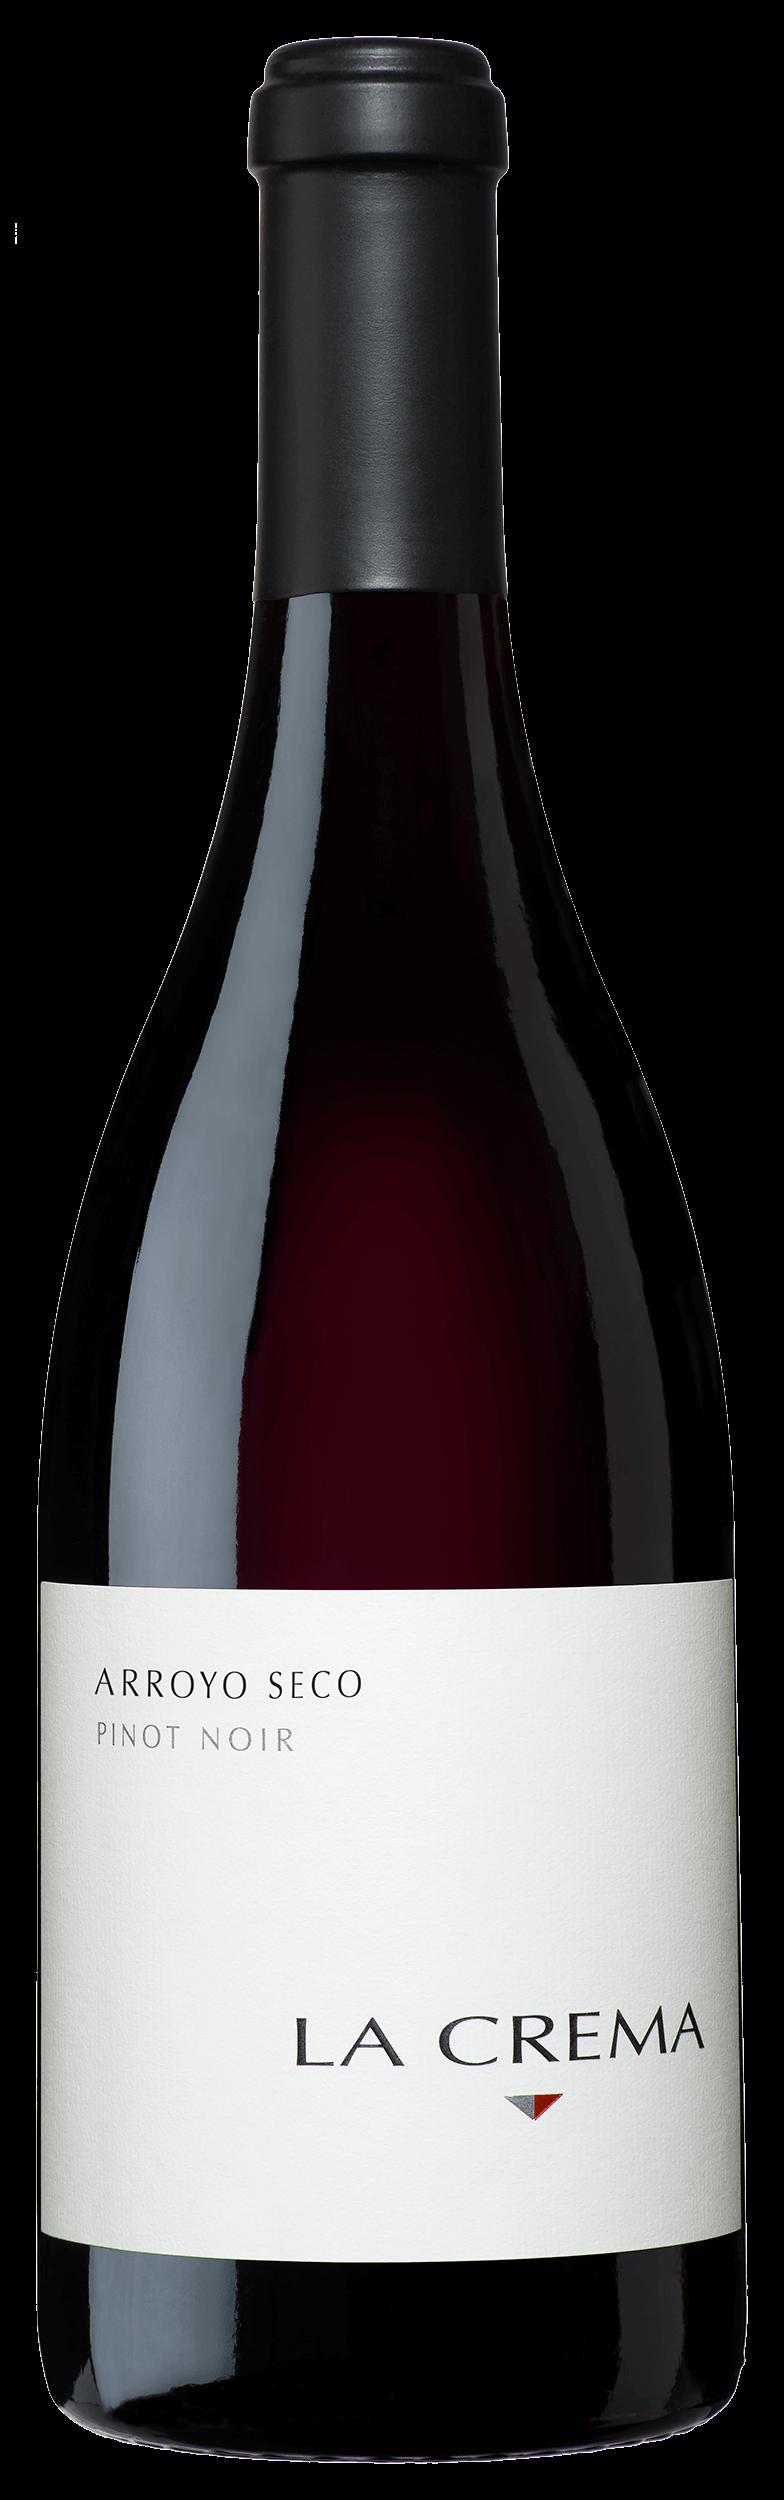 2017 Arroyo Seco Pinot Noir